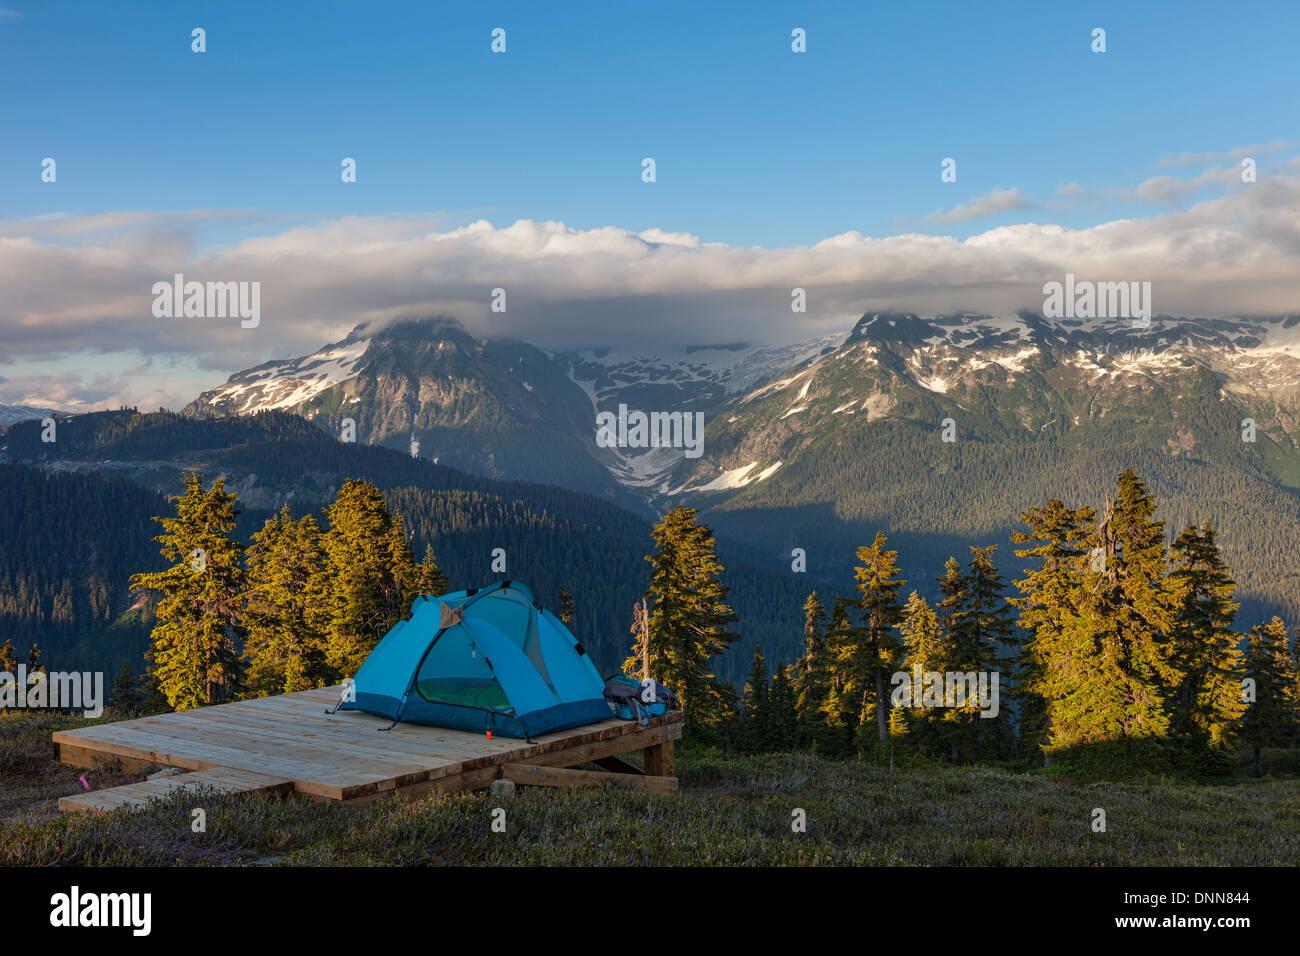 Campsite on Mountain - Stock Image